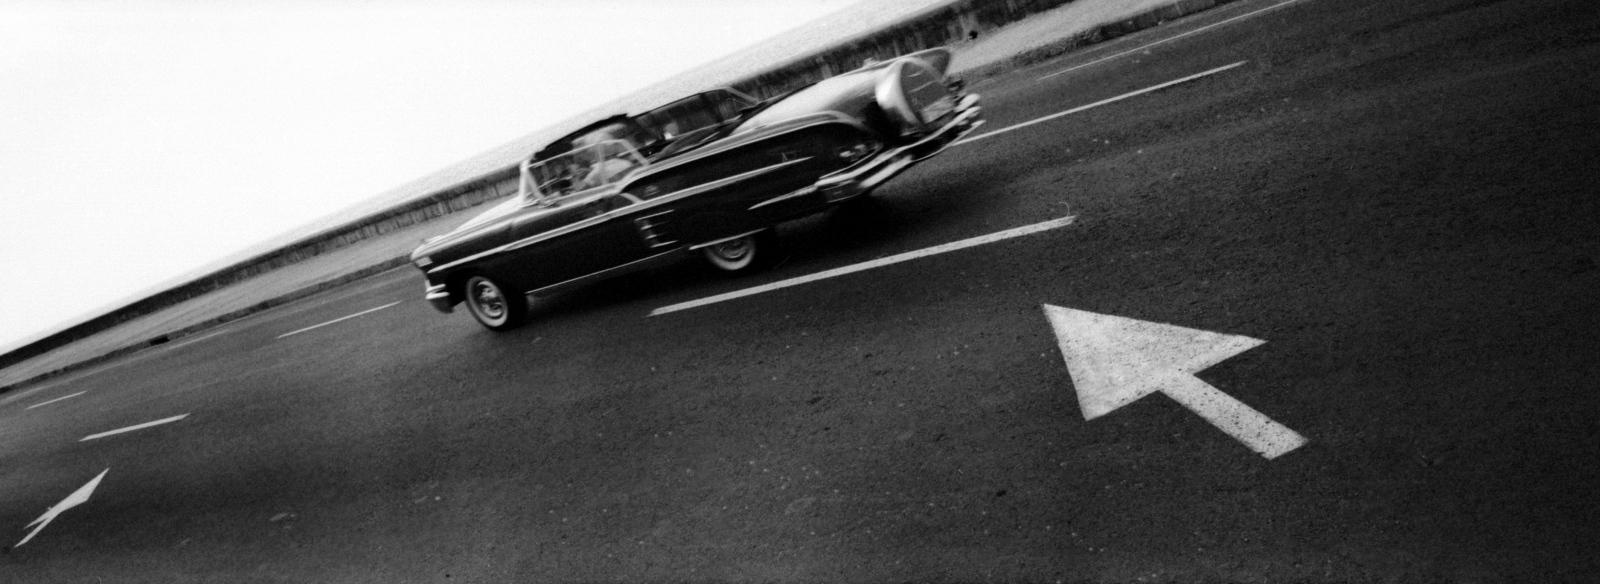 Photography image - Loading Habana_003.jpg